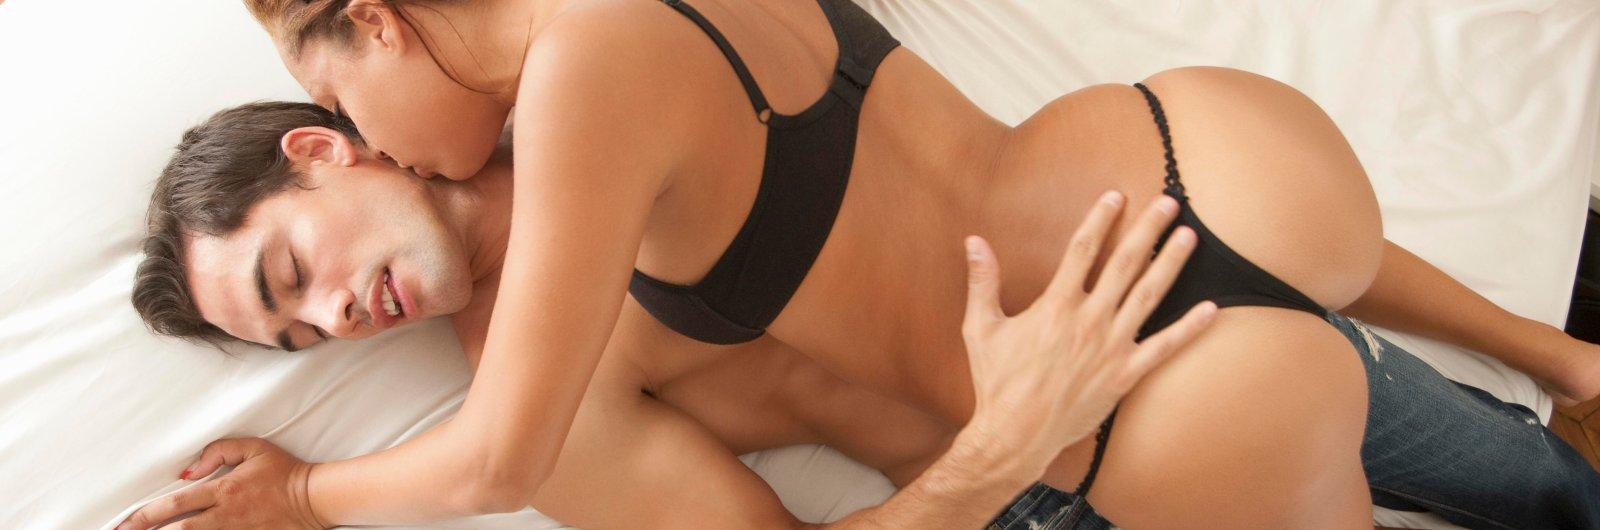 Dry humping sex